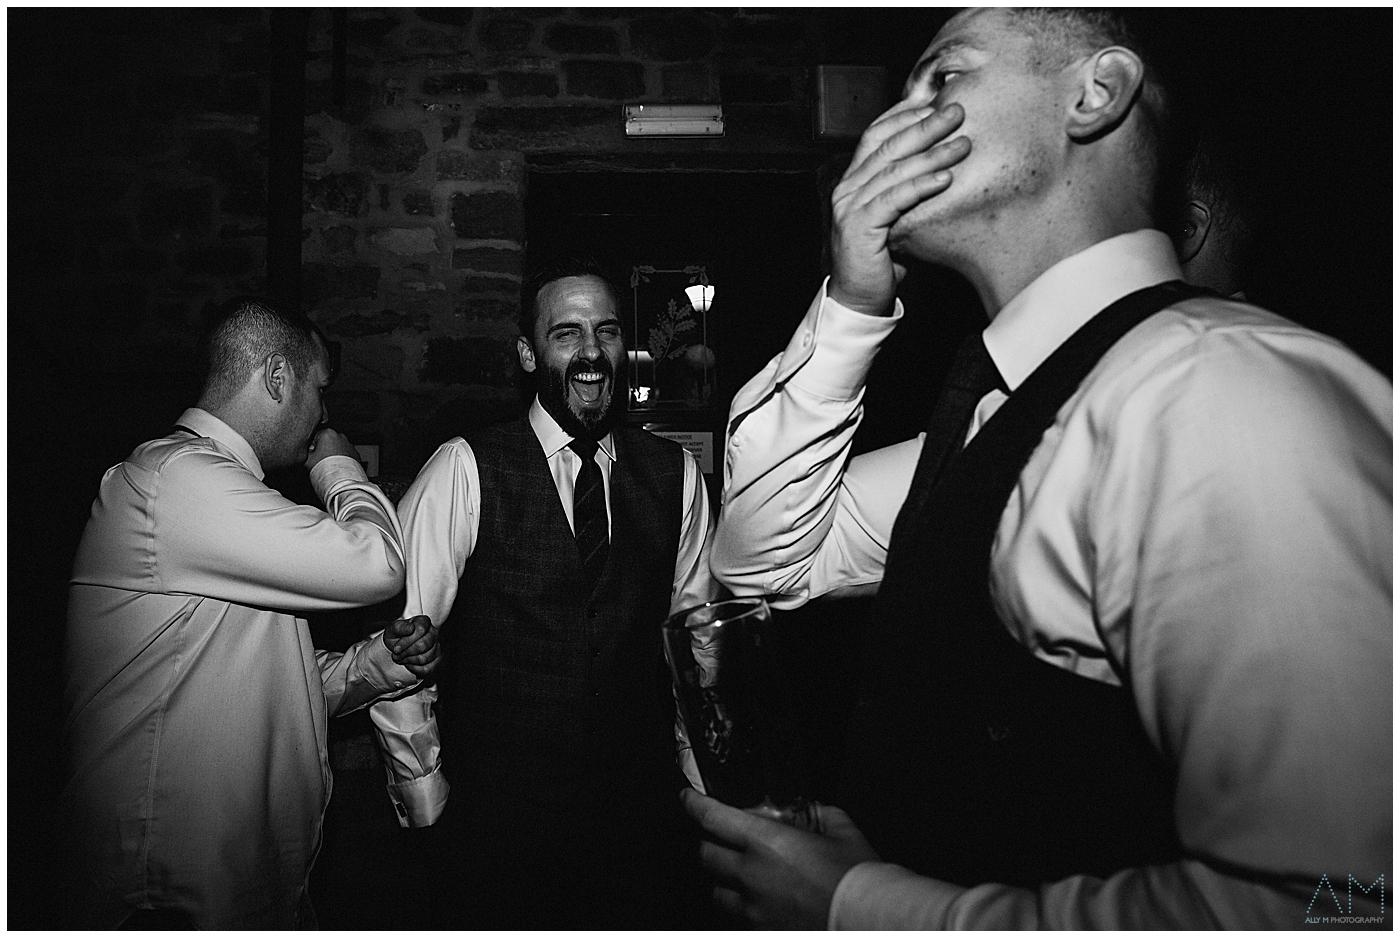 documentary wedding photography at beeston manore